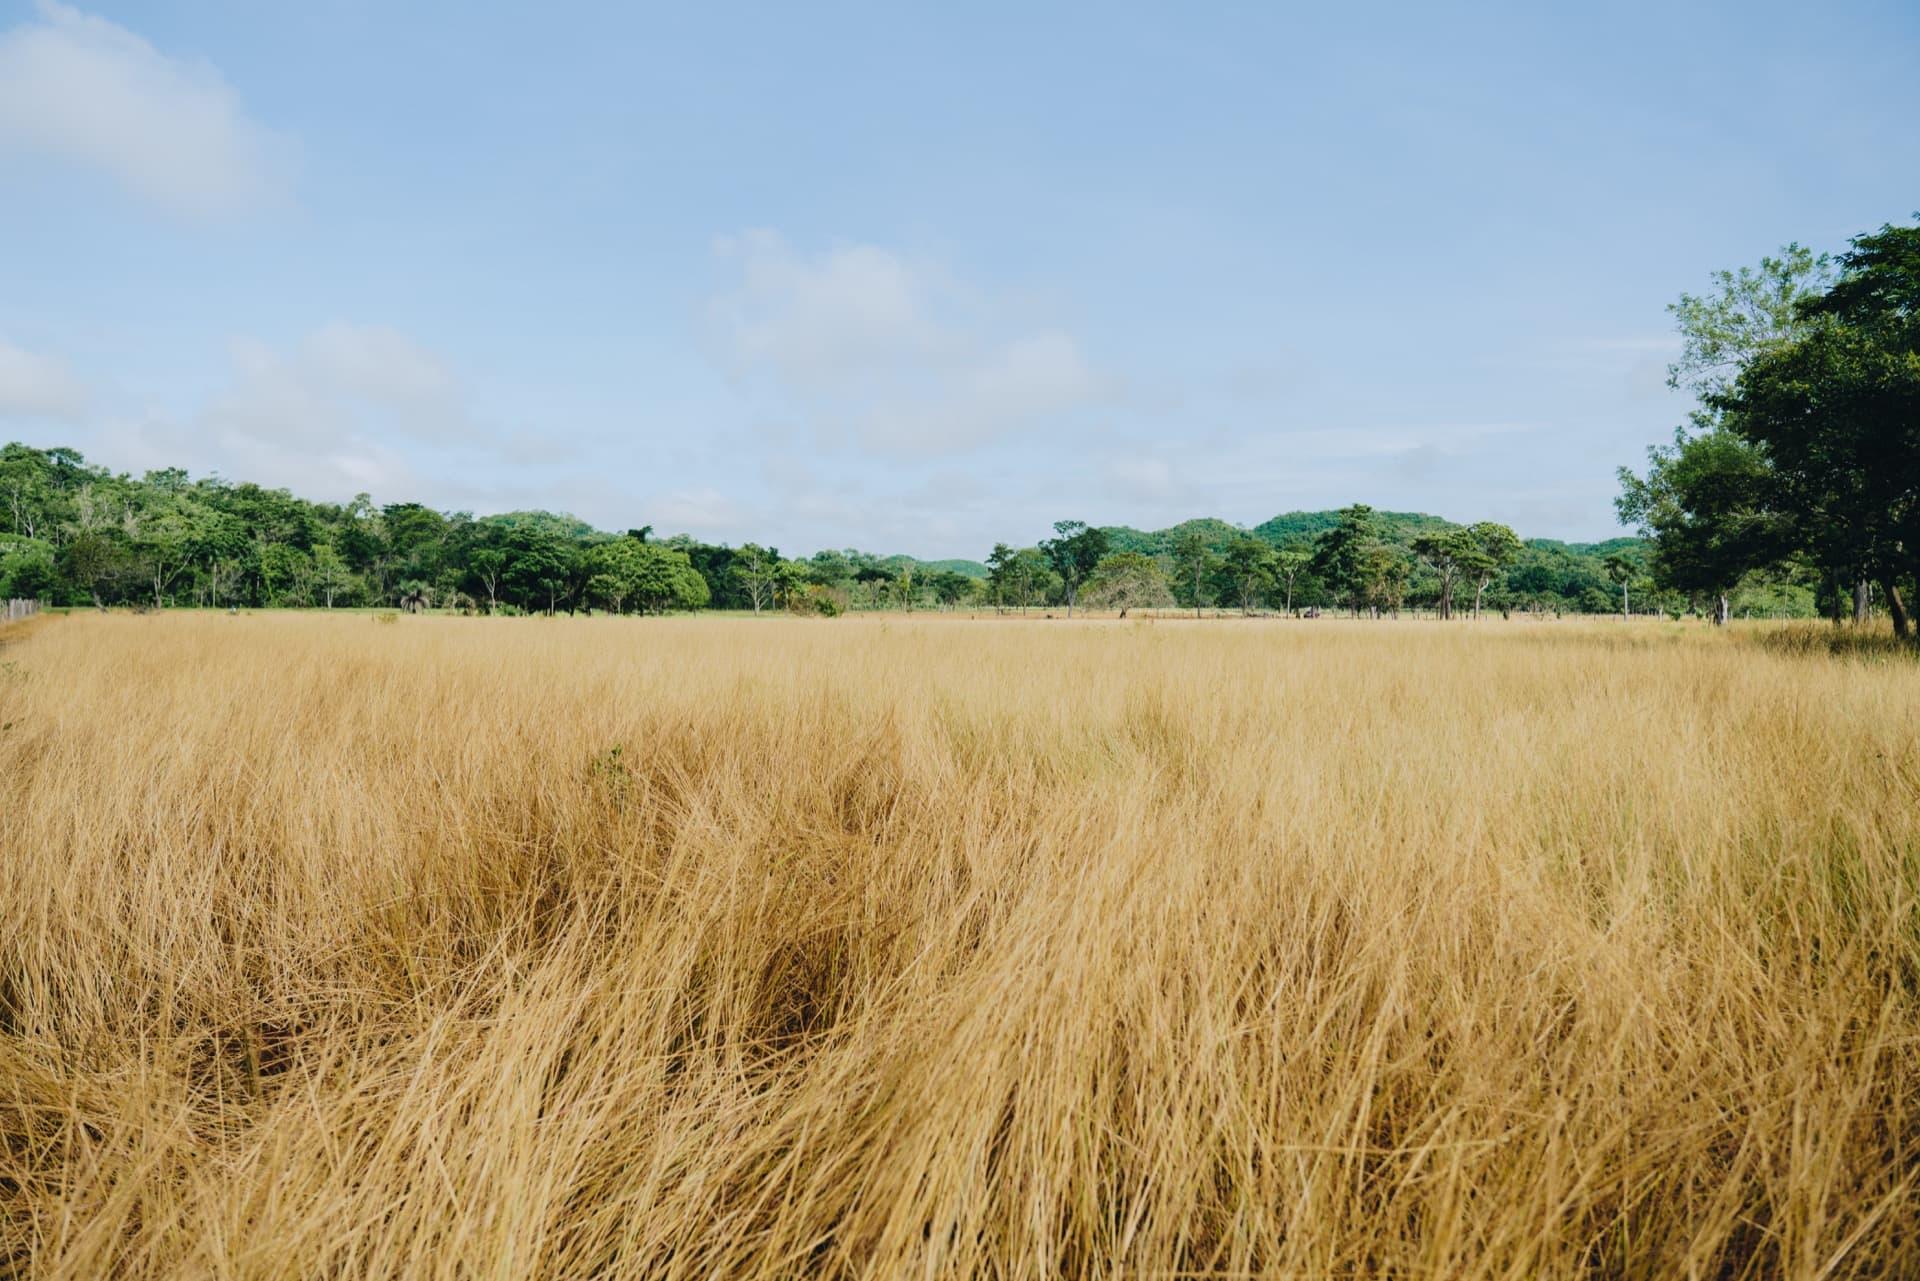 Supports reforestation plans worldwide